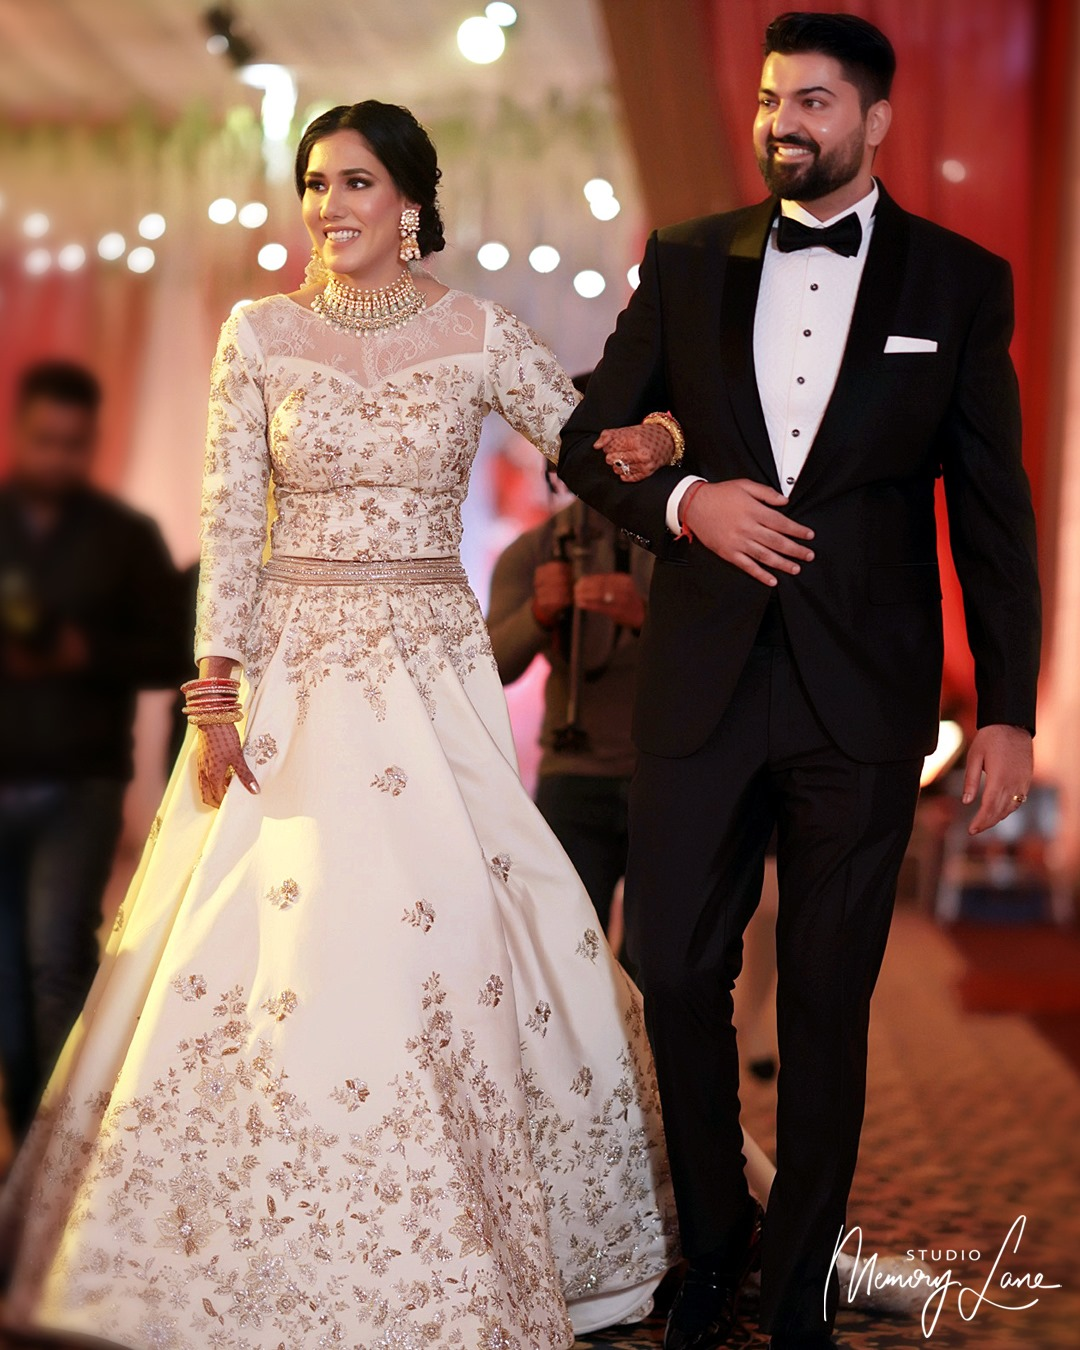 Best Photographers in Phagwara - Cute and Elegant couple